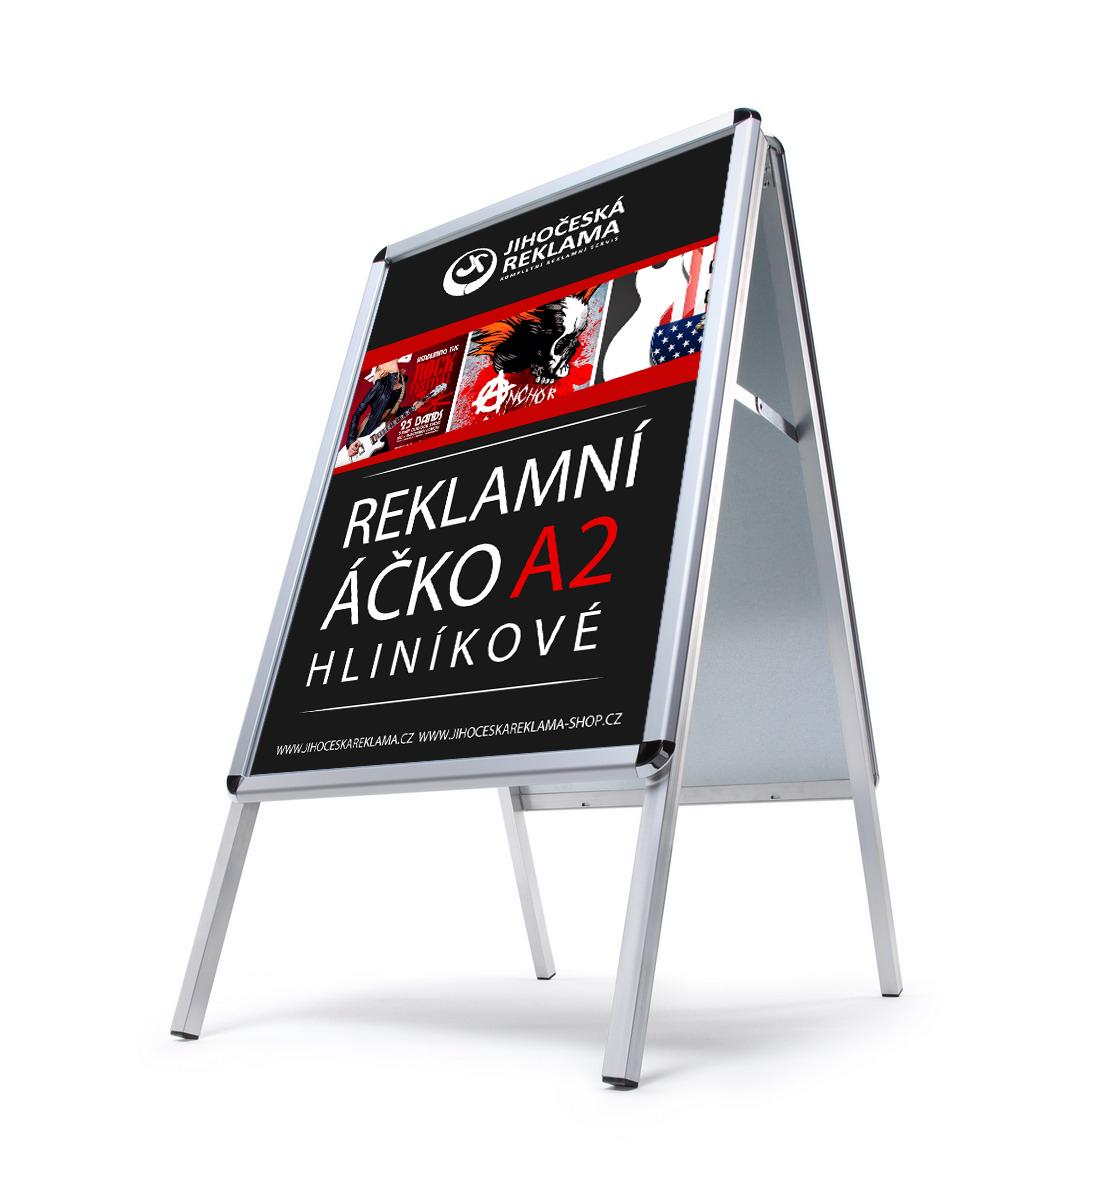 Jihočeská reklama Reklamí stojan - áčko A2